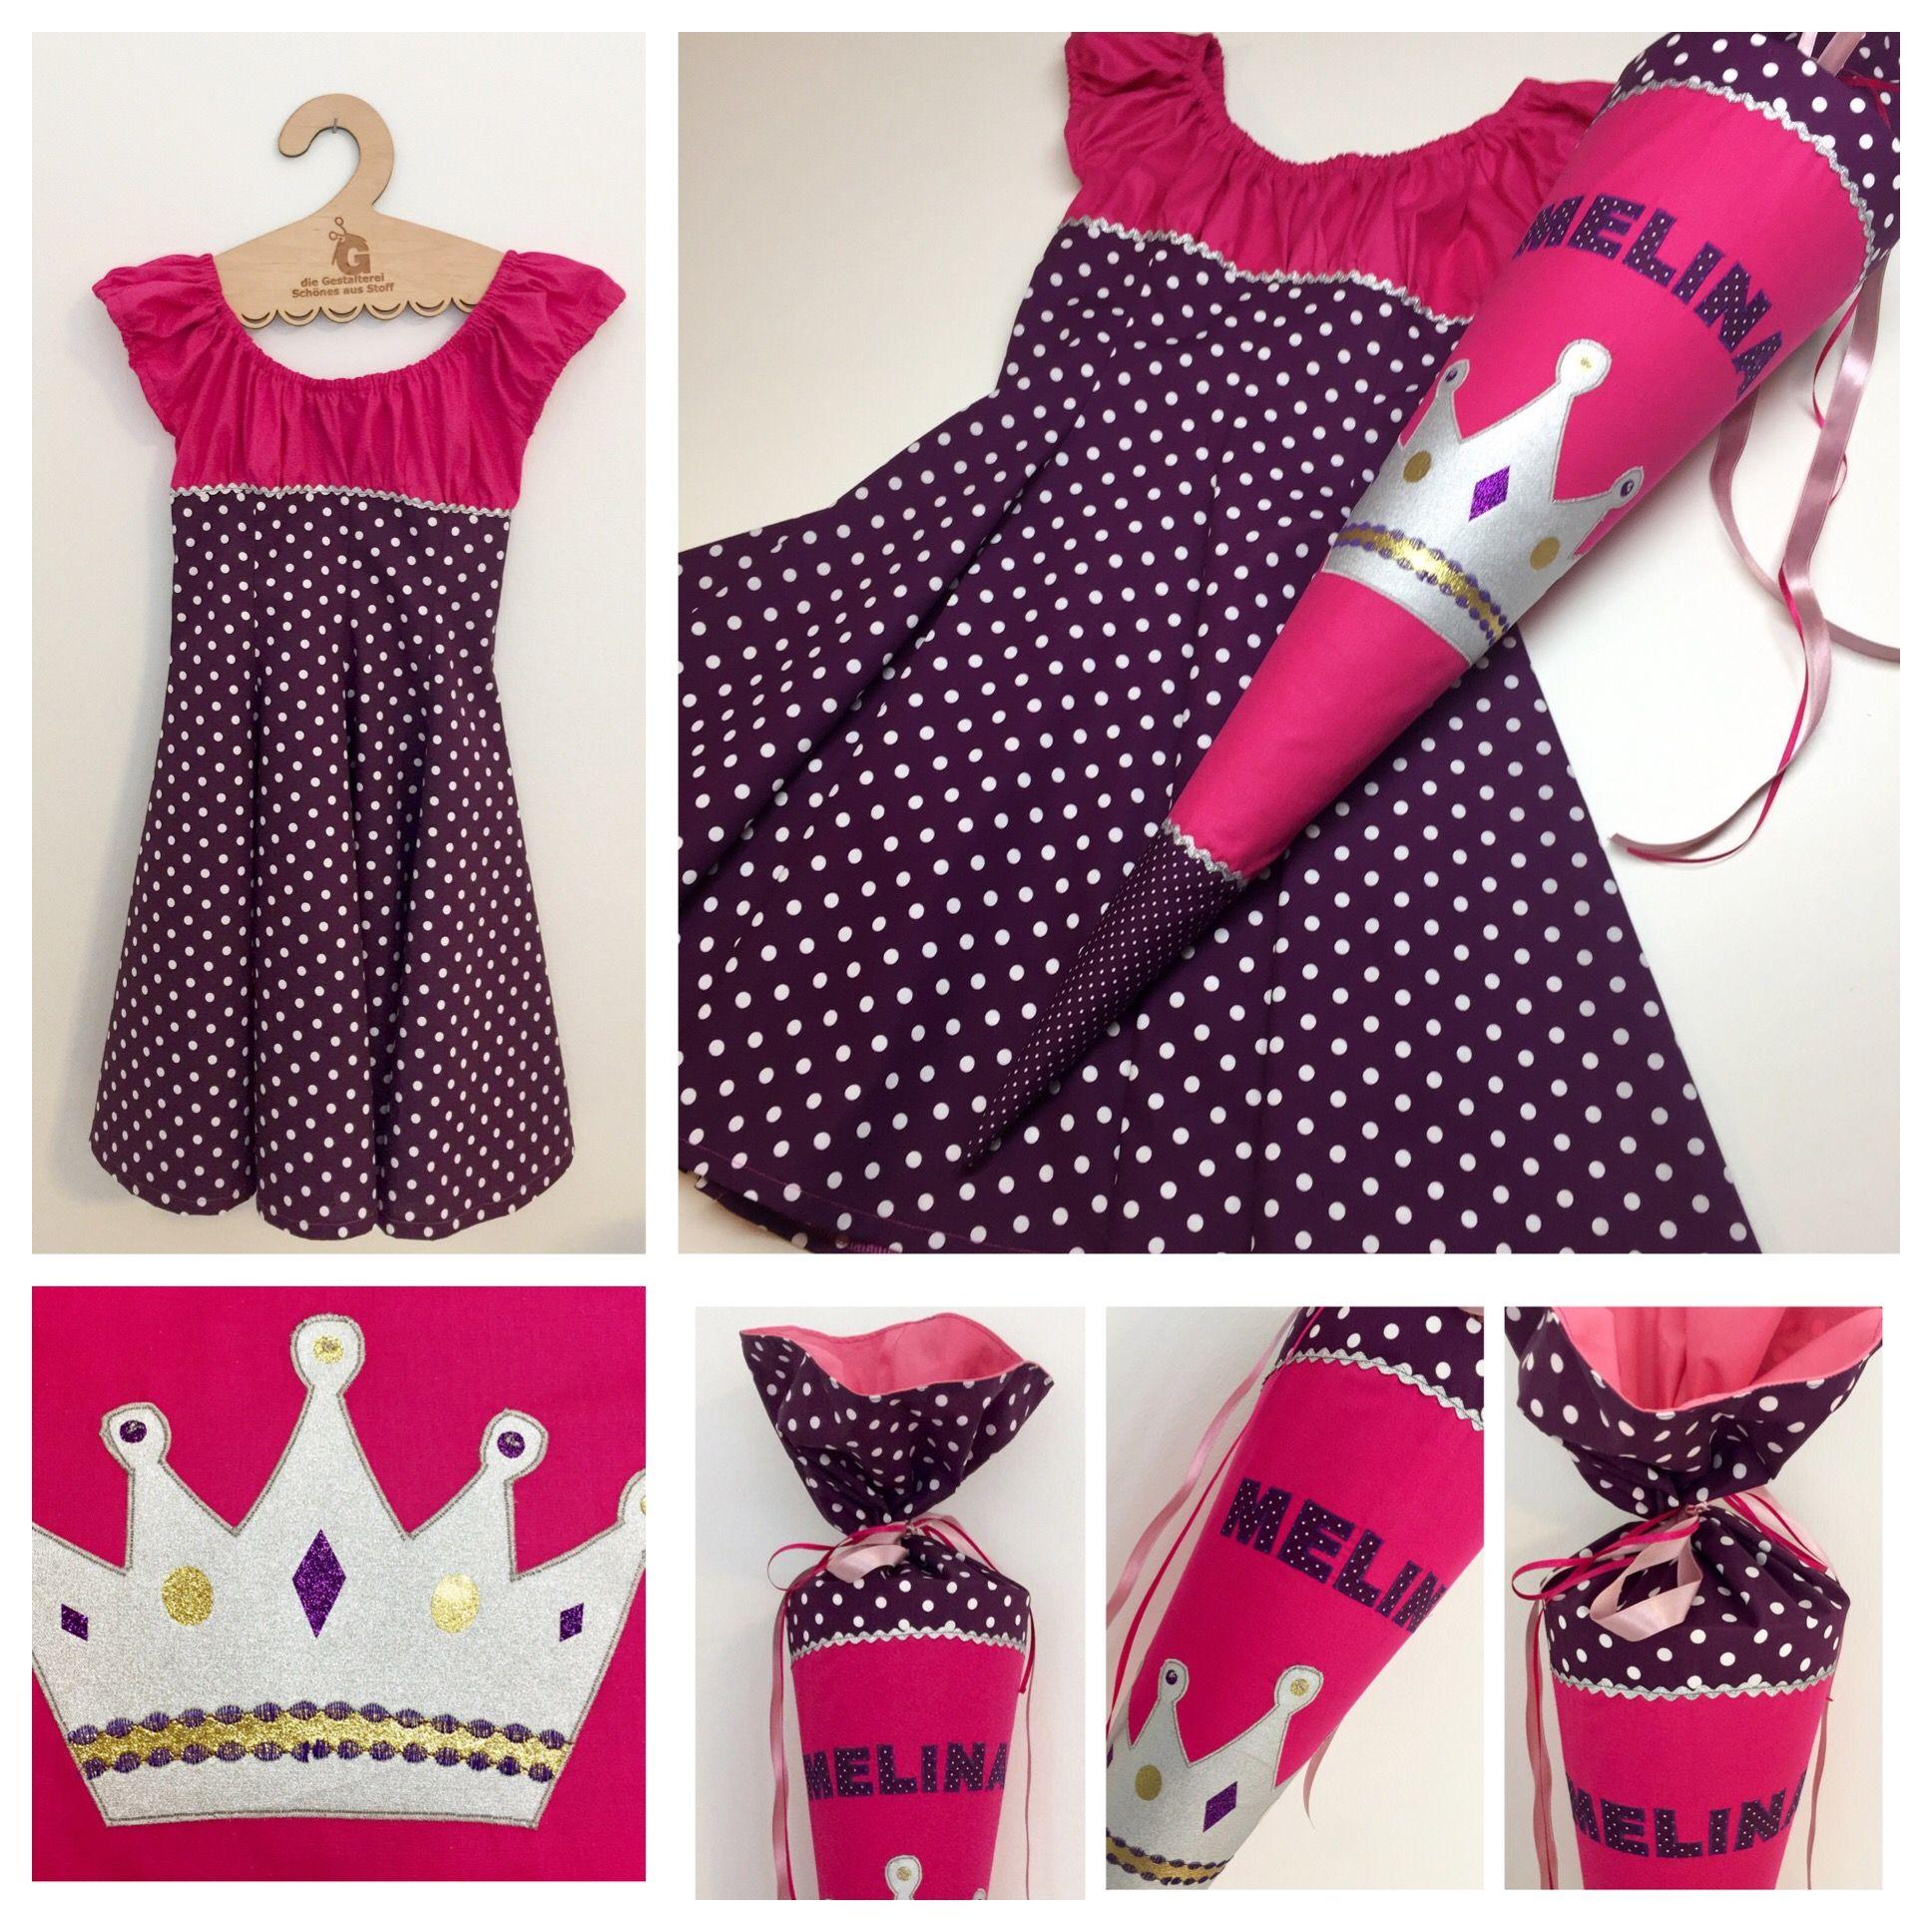 schultüte aus stoff, ergobag lumi perlentauchbär, lila, pink